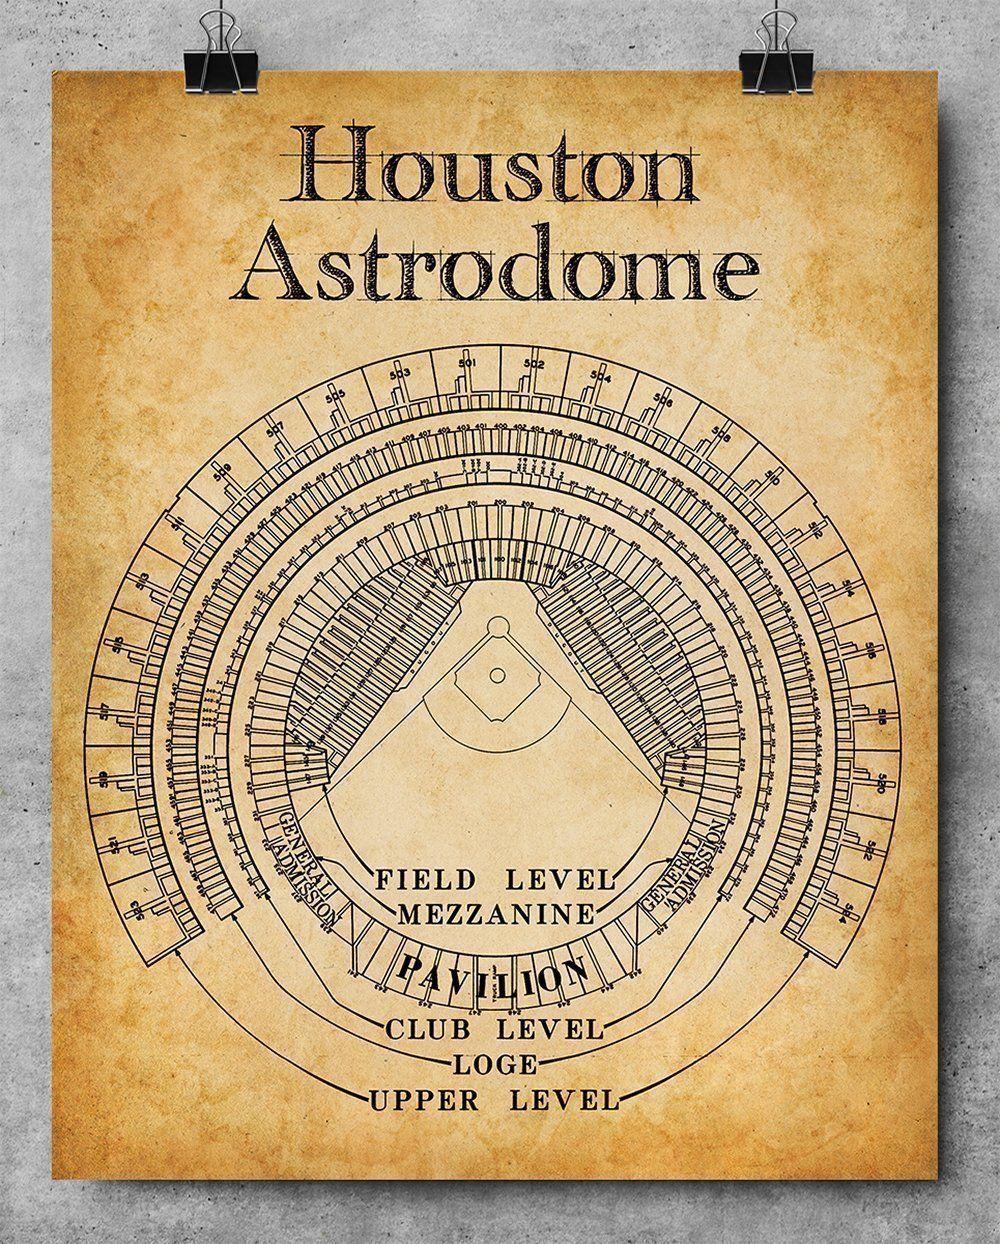 Houston Astrodome Stadium Seating Chart Art Print - 11x14 Unframed ...